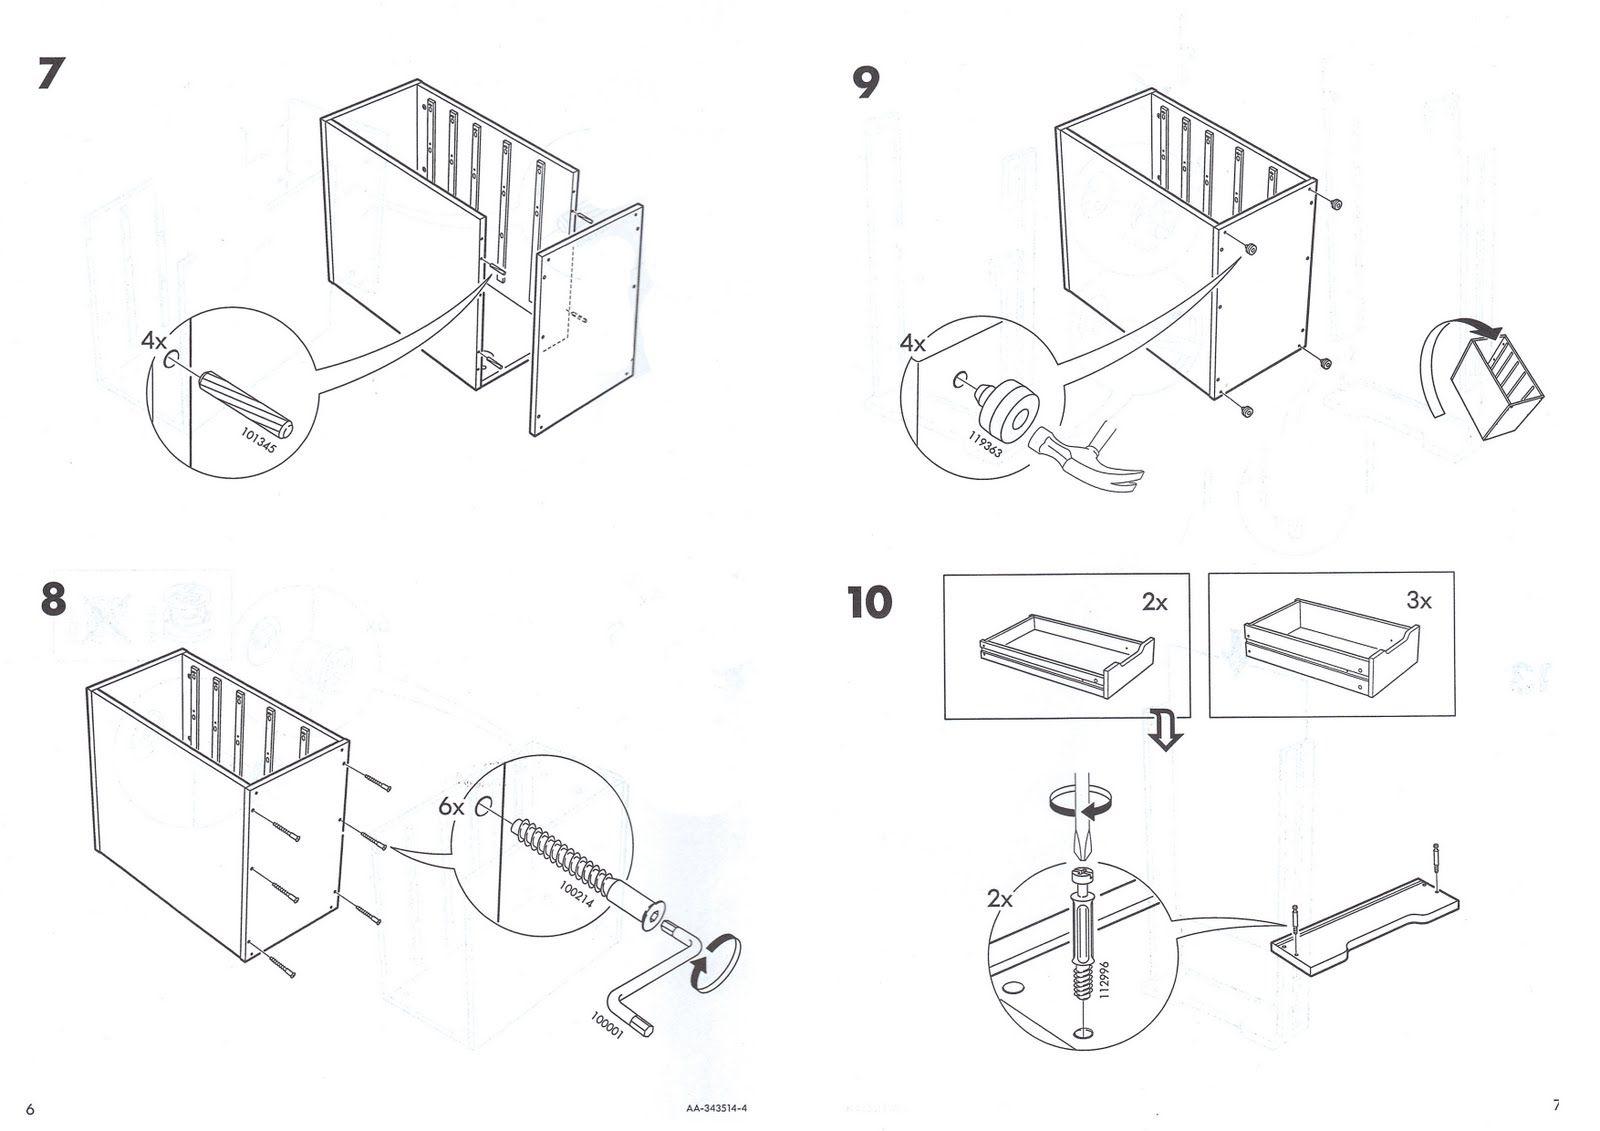 Ikea Instruction Details Instructions Manual Ikea